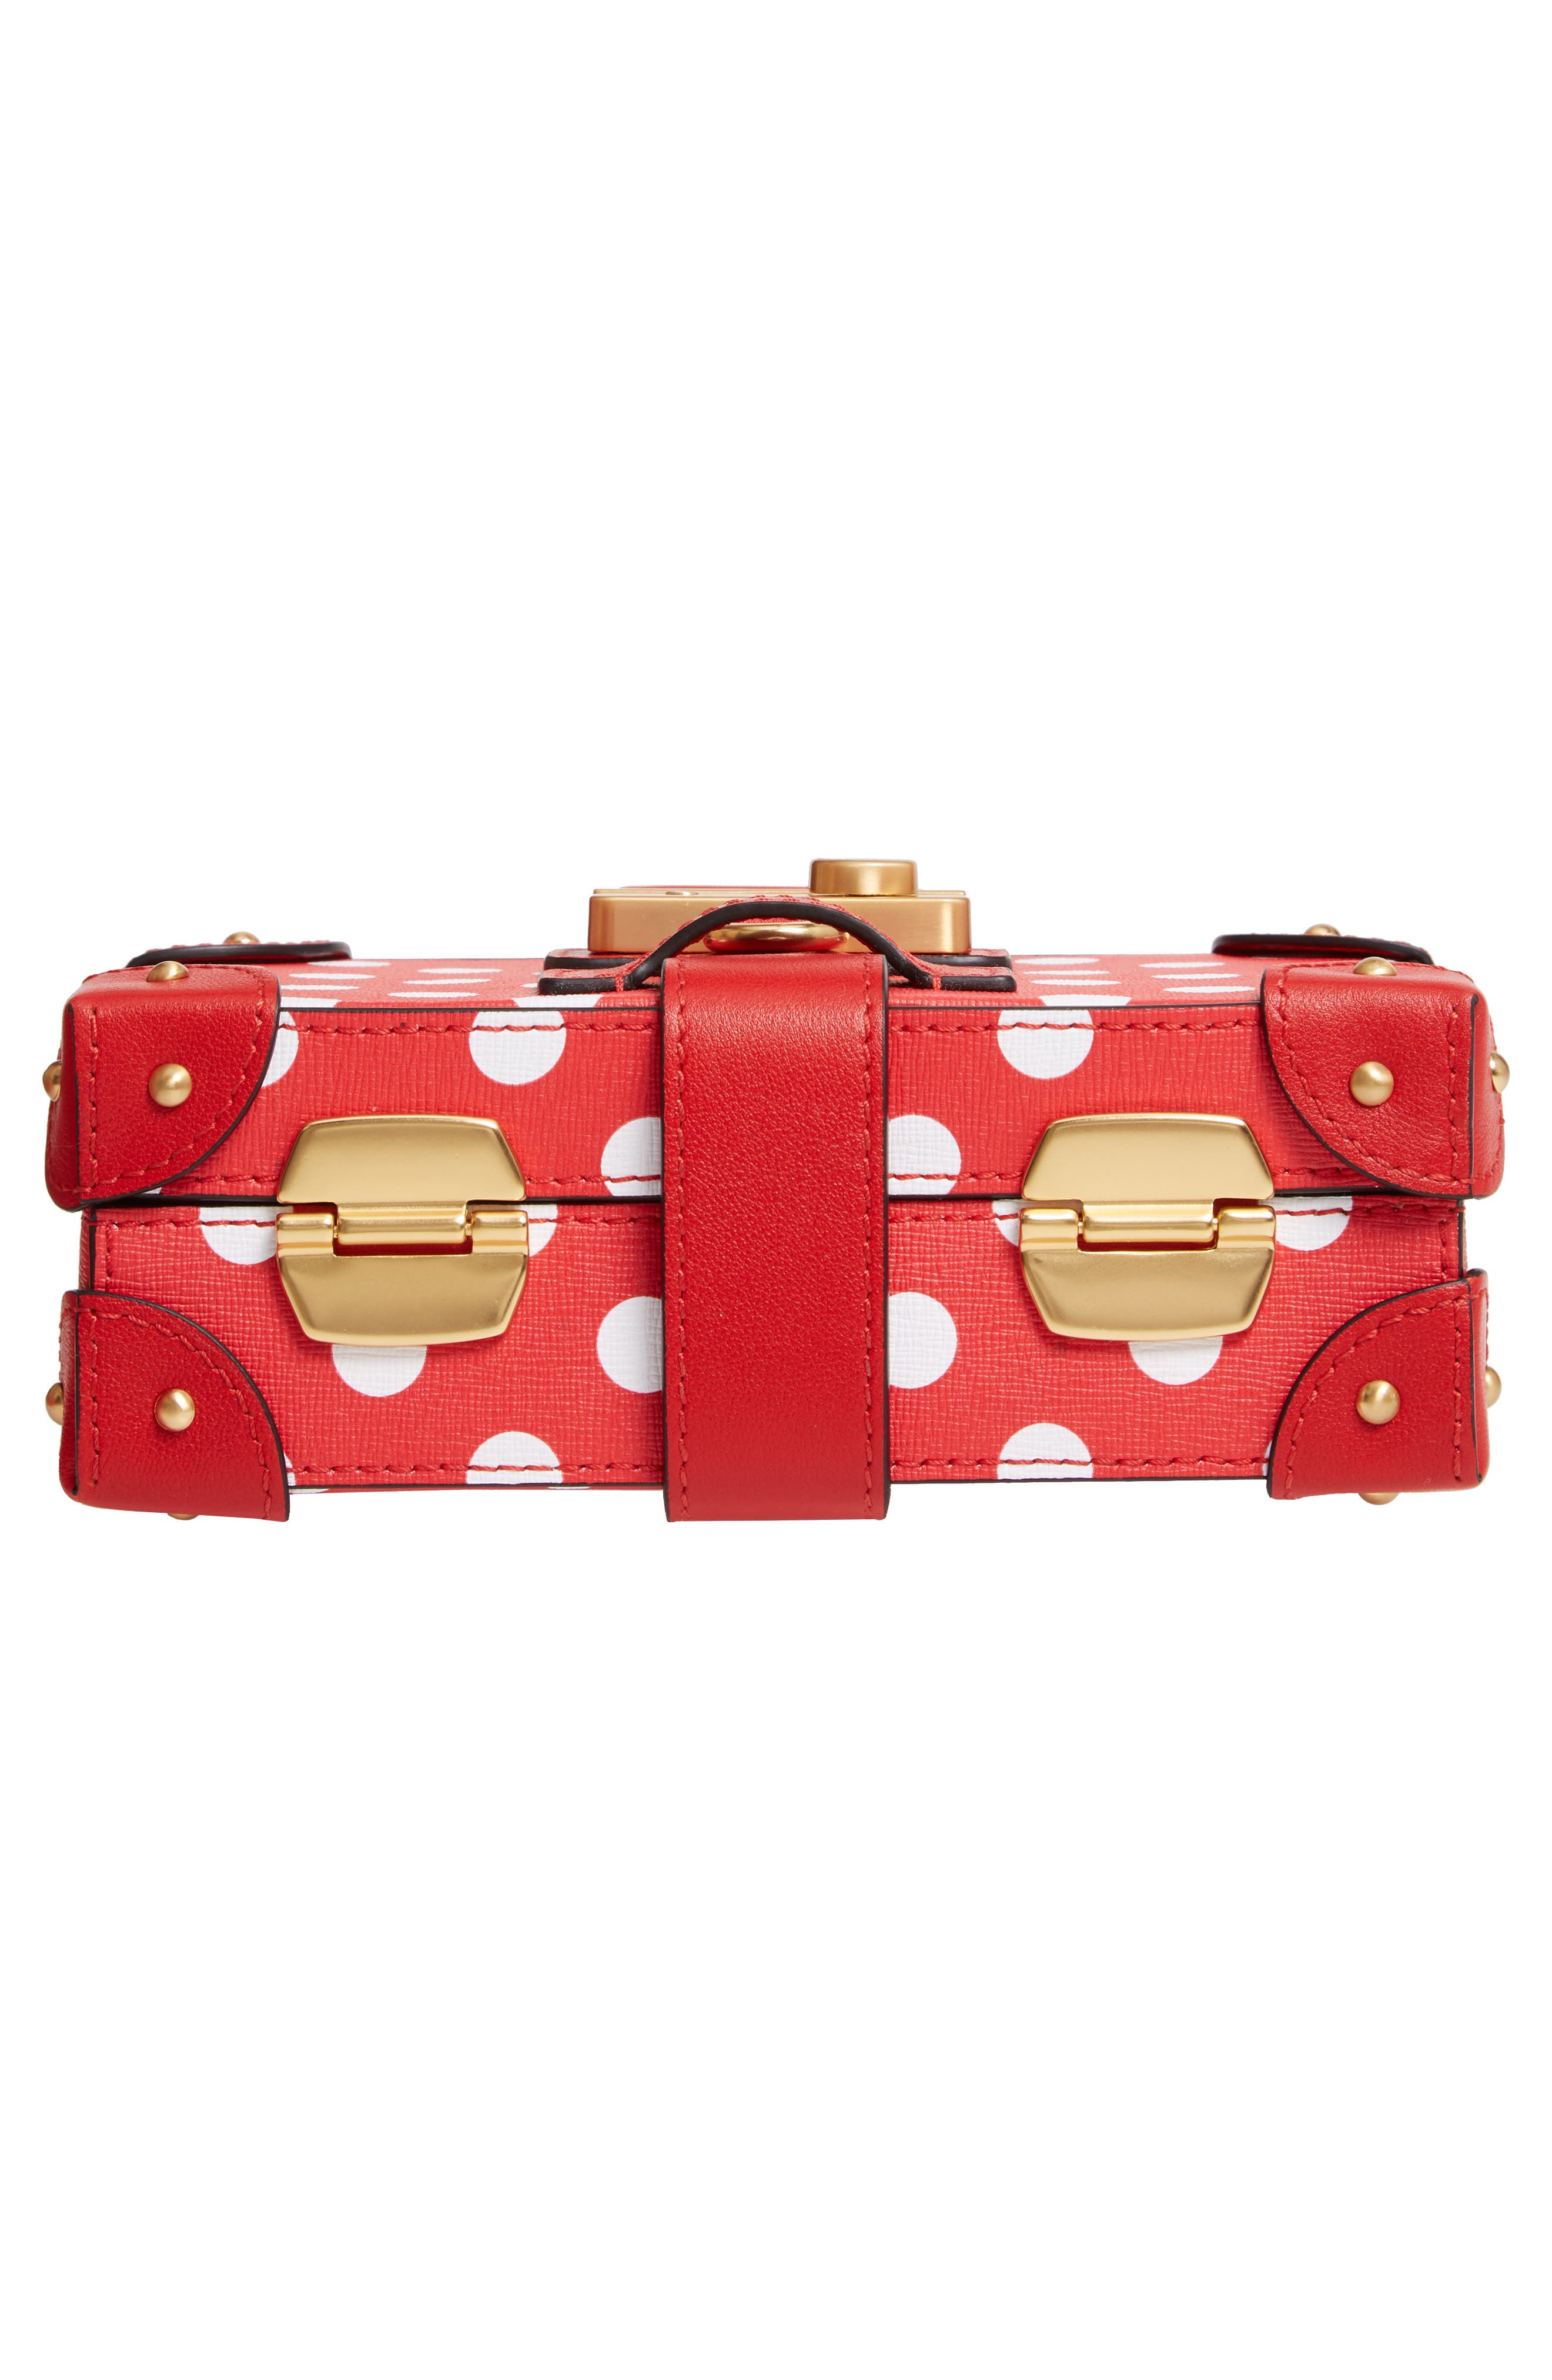 MOSCHINO, Polka Dot Box Leather Crossbody Bag, Alternate thumbnail 6, color, RED